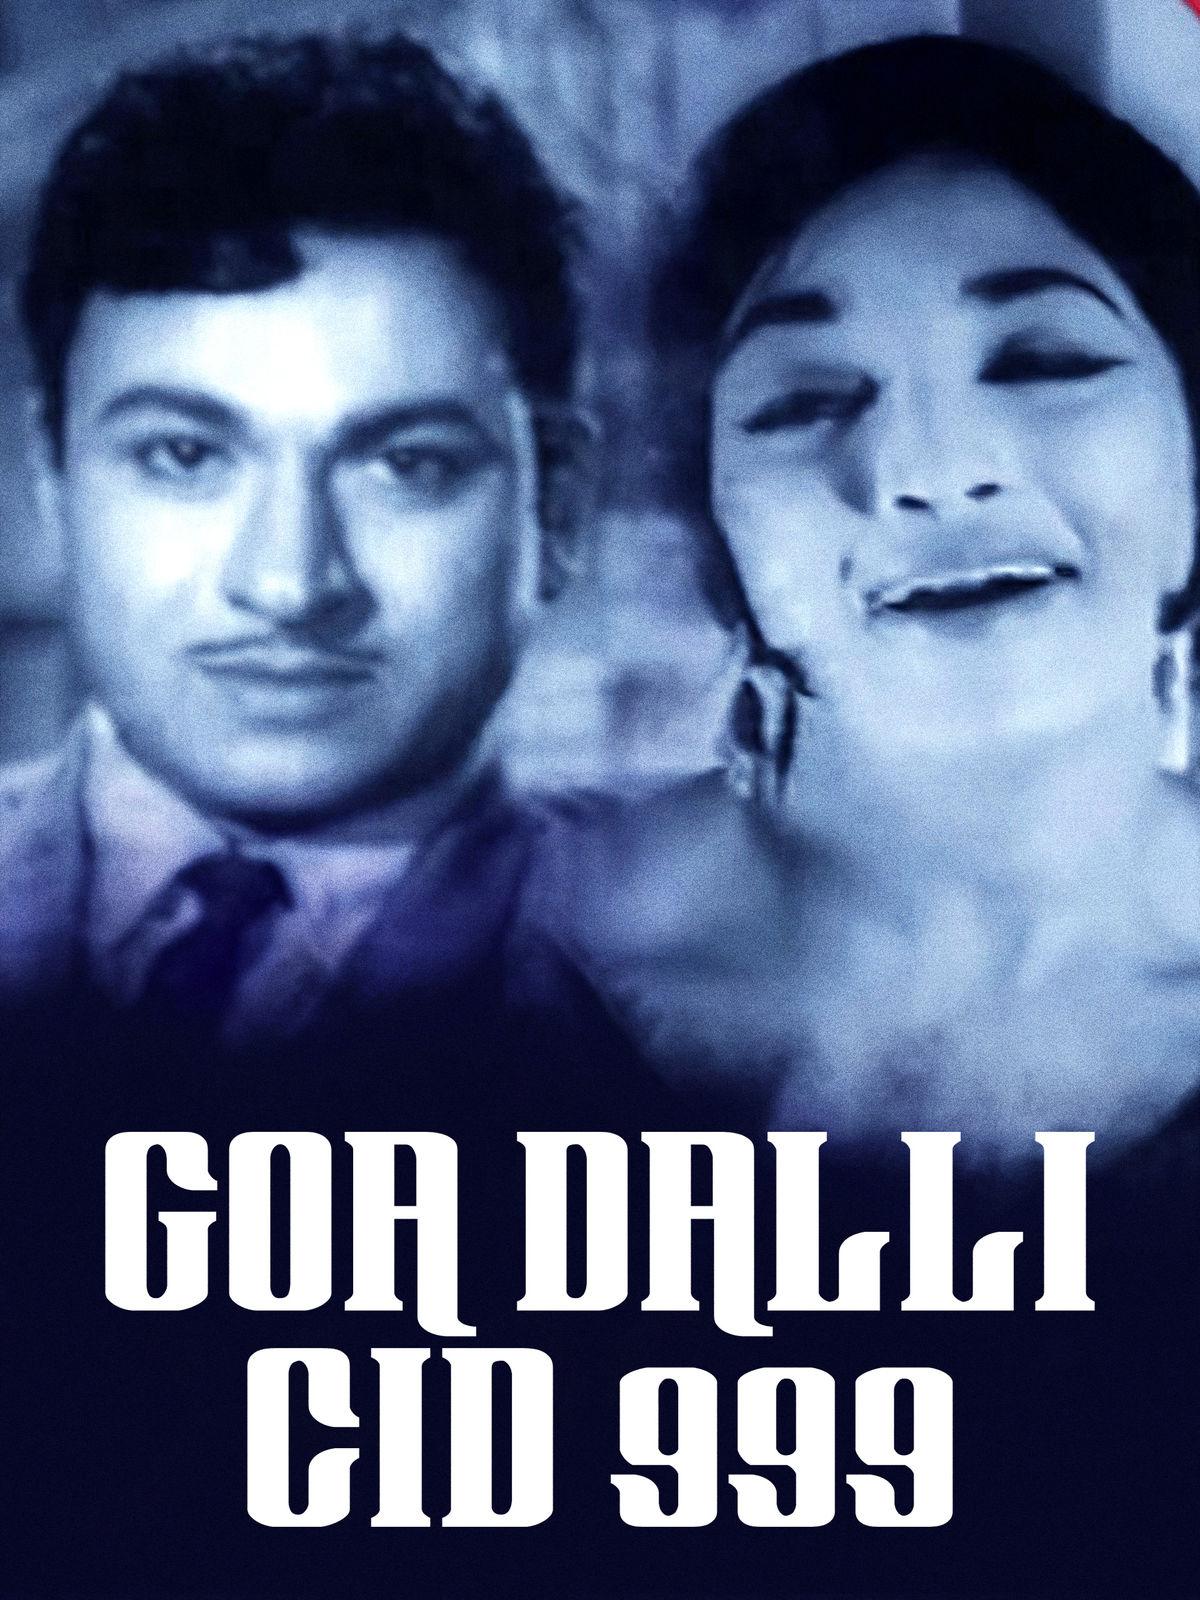 Goa Dalli CID 999